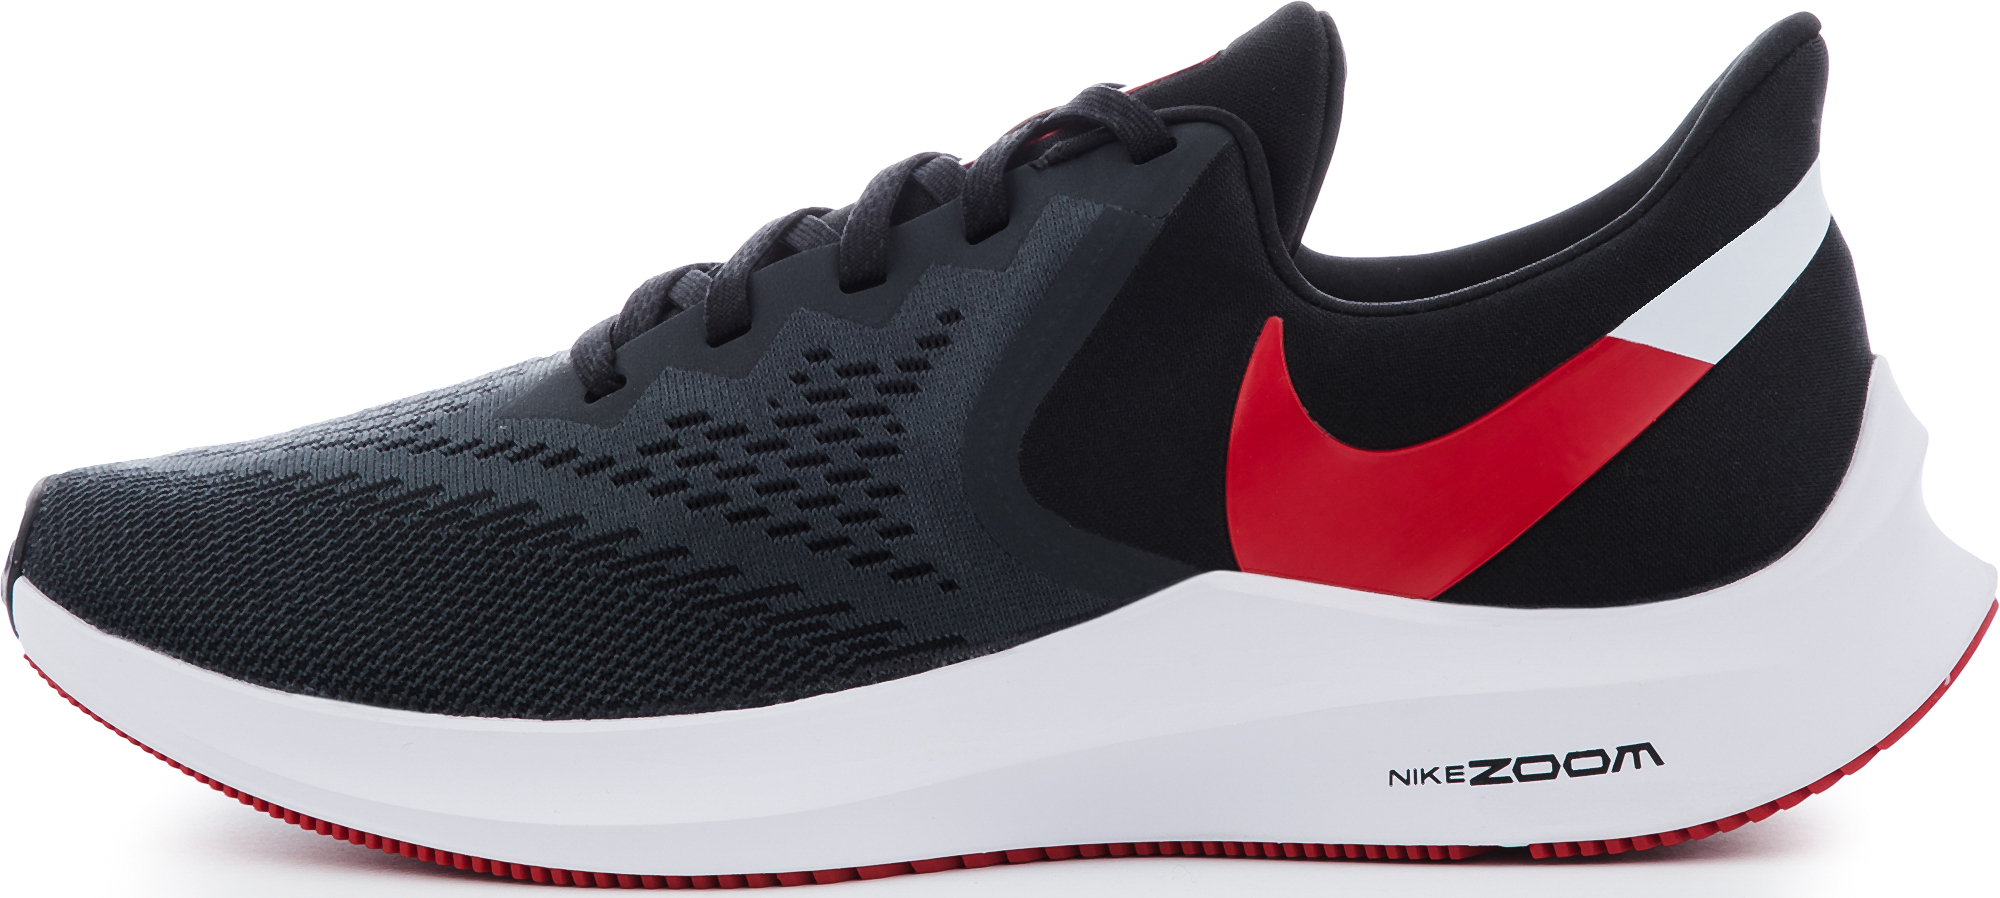 Nike Кроссовки мужские Nike Zoom Winflo 6, размер 44 цена